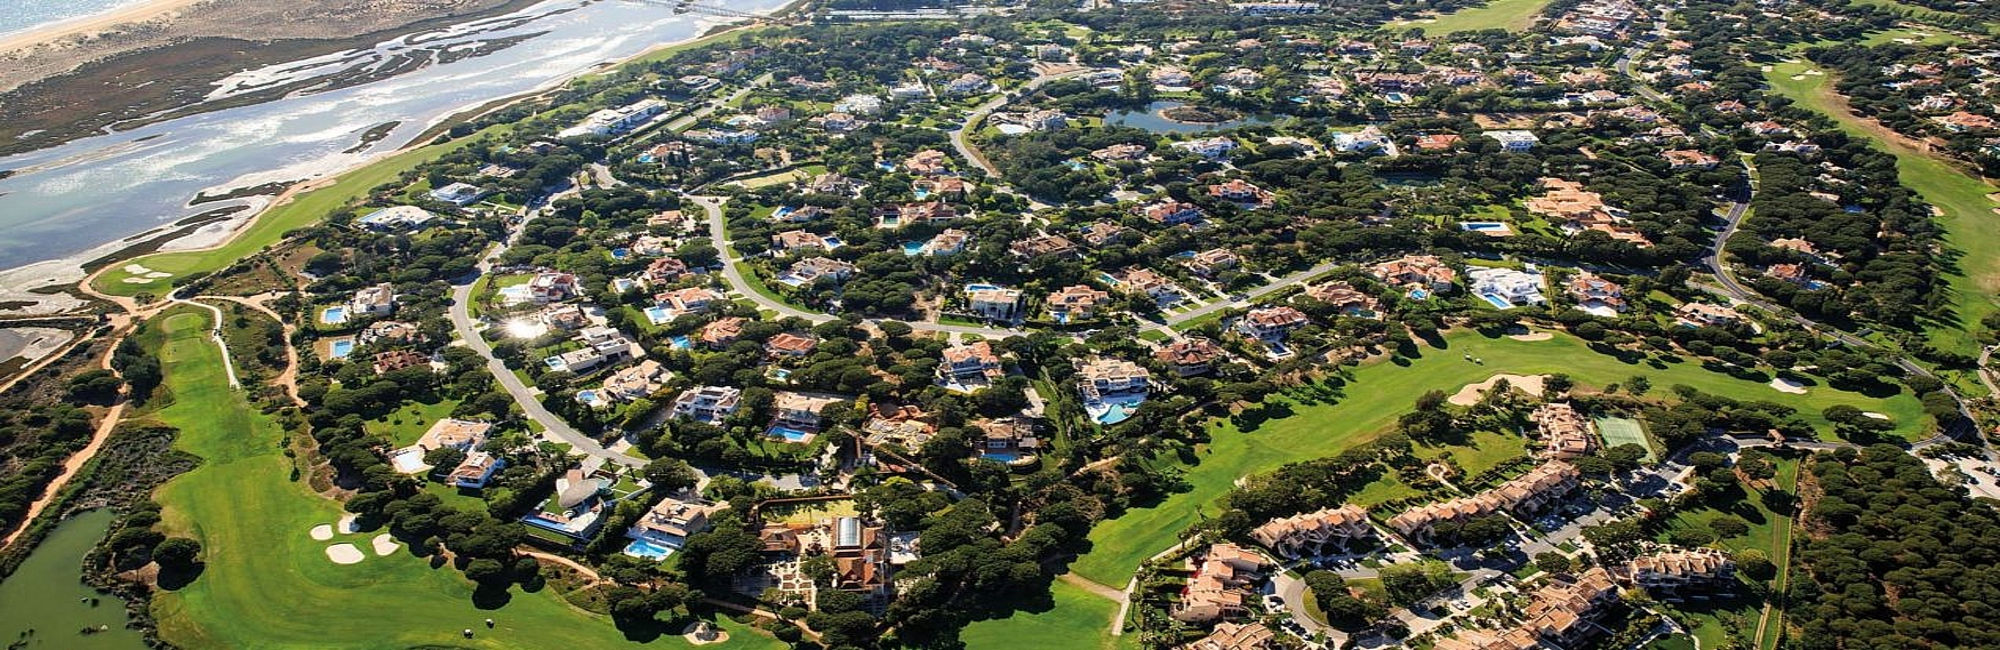 Quinta do Lago aerial view